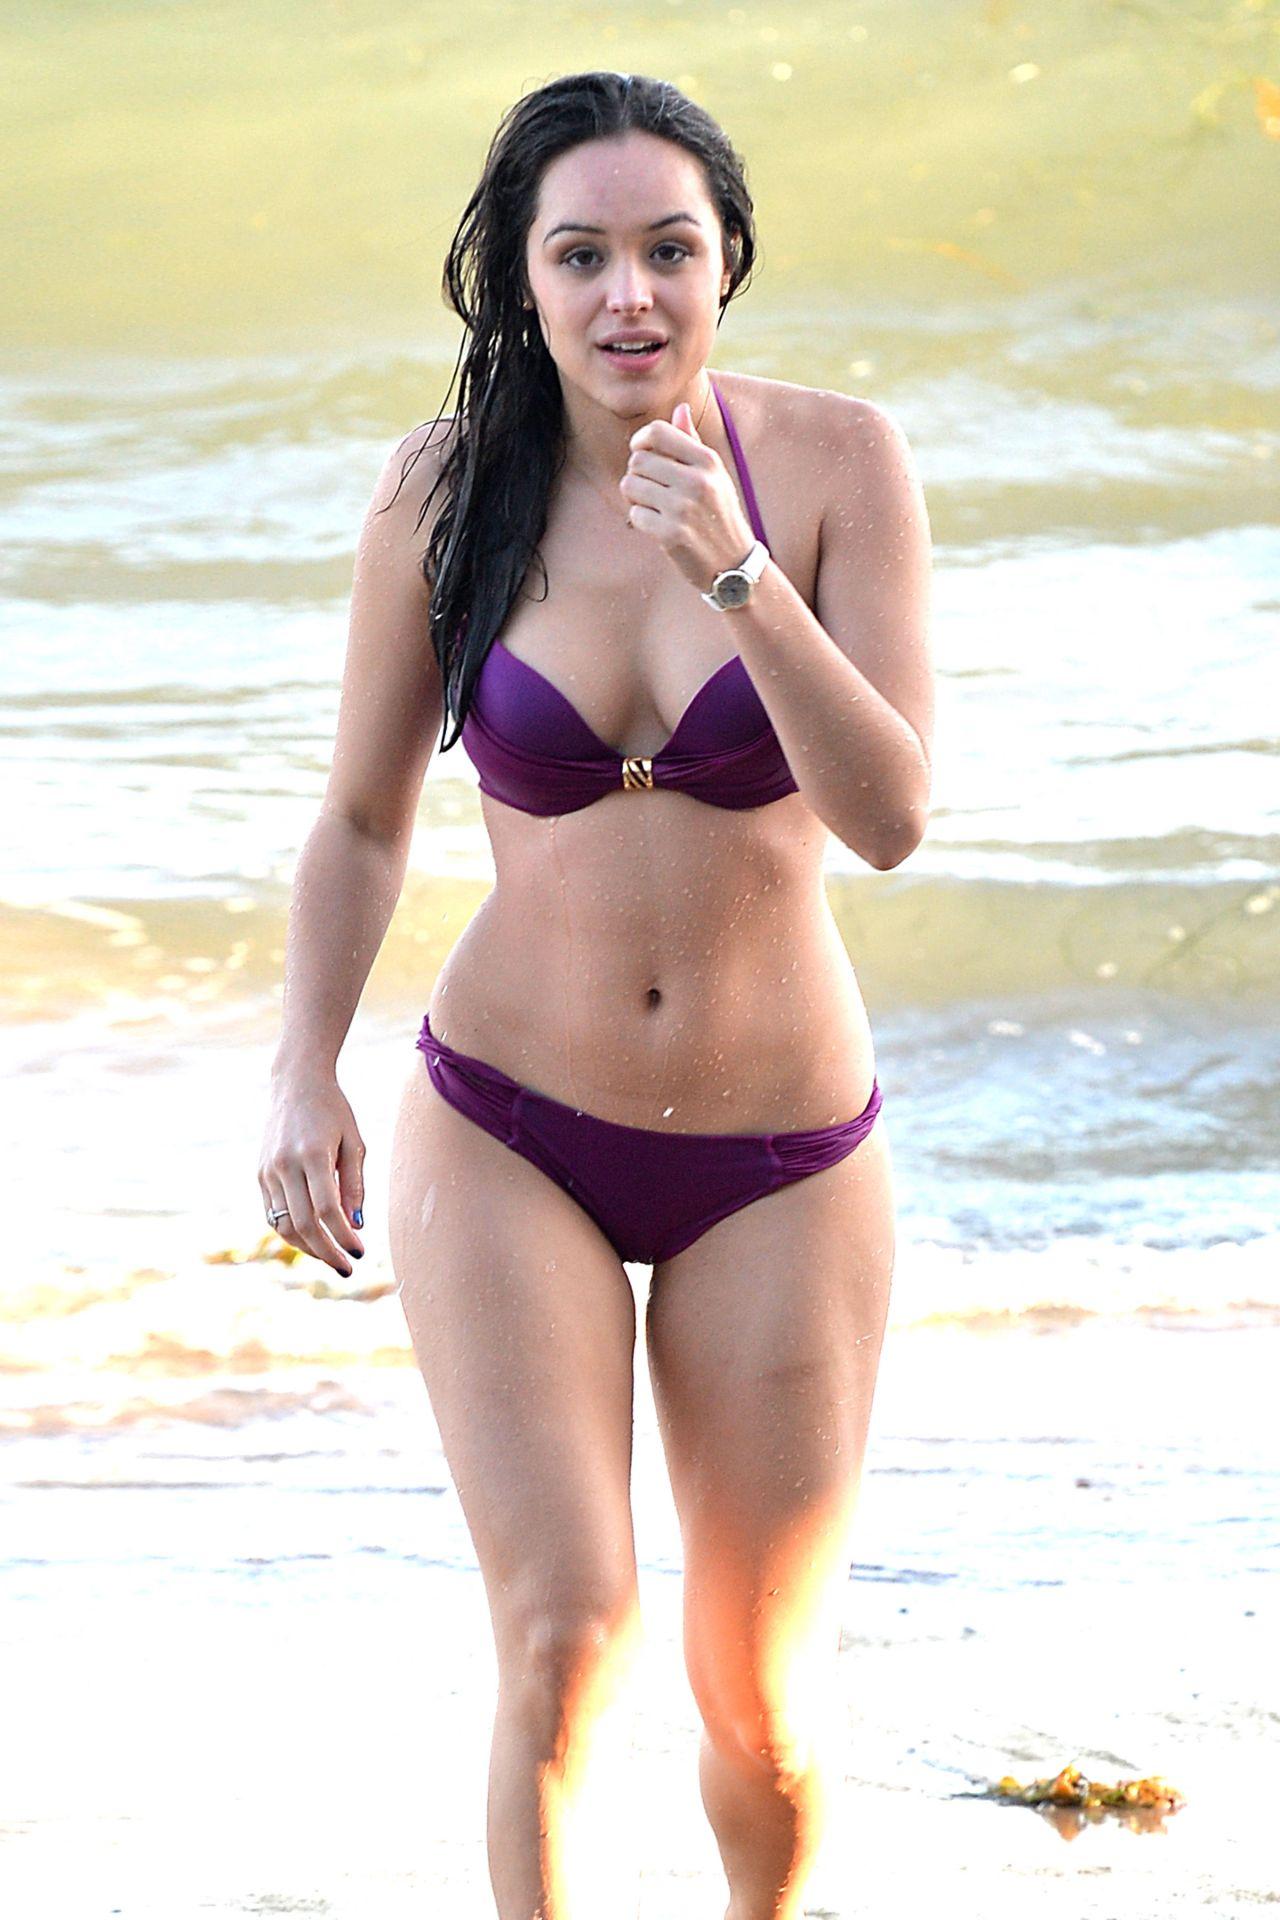 Hayley Orrantia in a Bikini at the Beach in Los Angeles